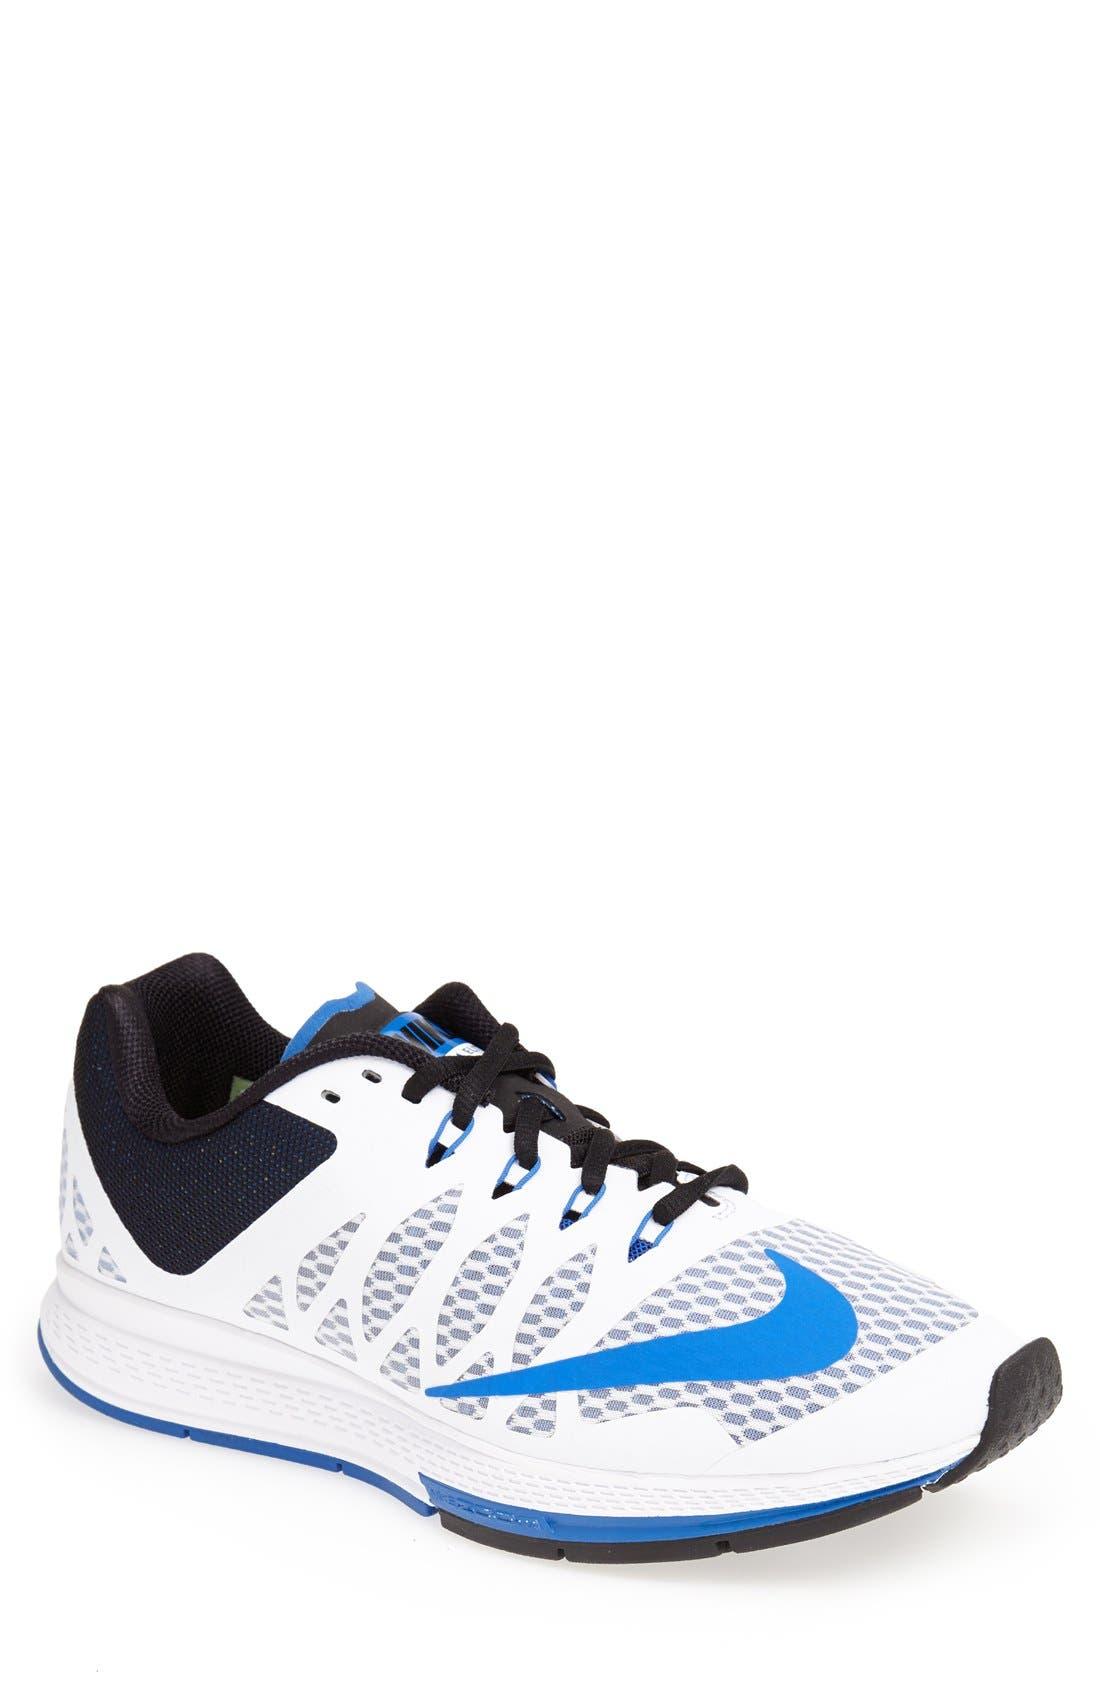 Alternate Image 1 Selected - Nike 'Zoom Elite 7' Running Shoe (Men)